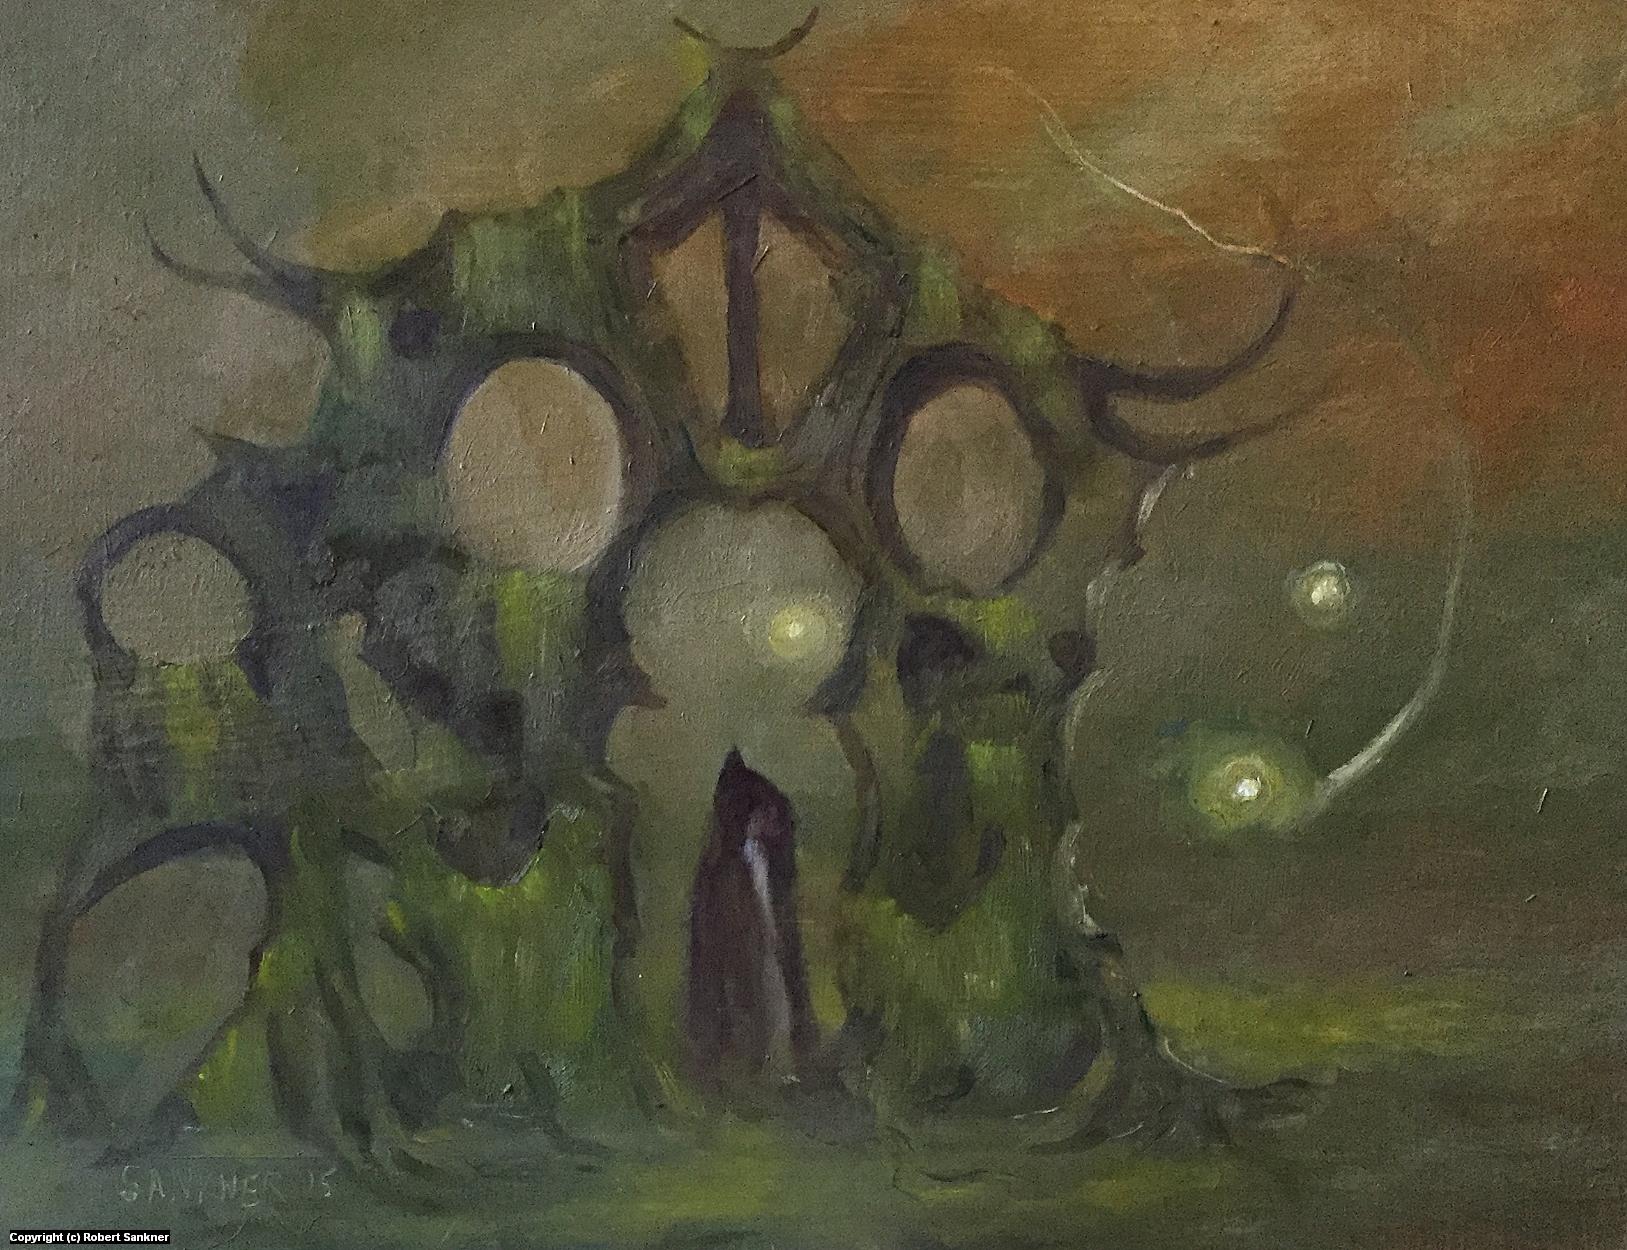 Relic Artwork by Robert Sankner